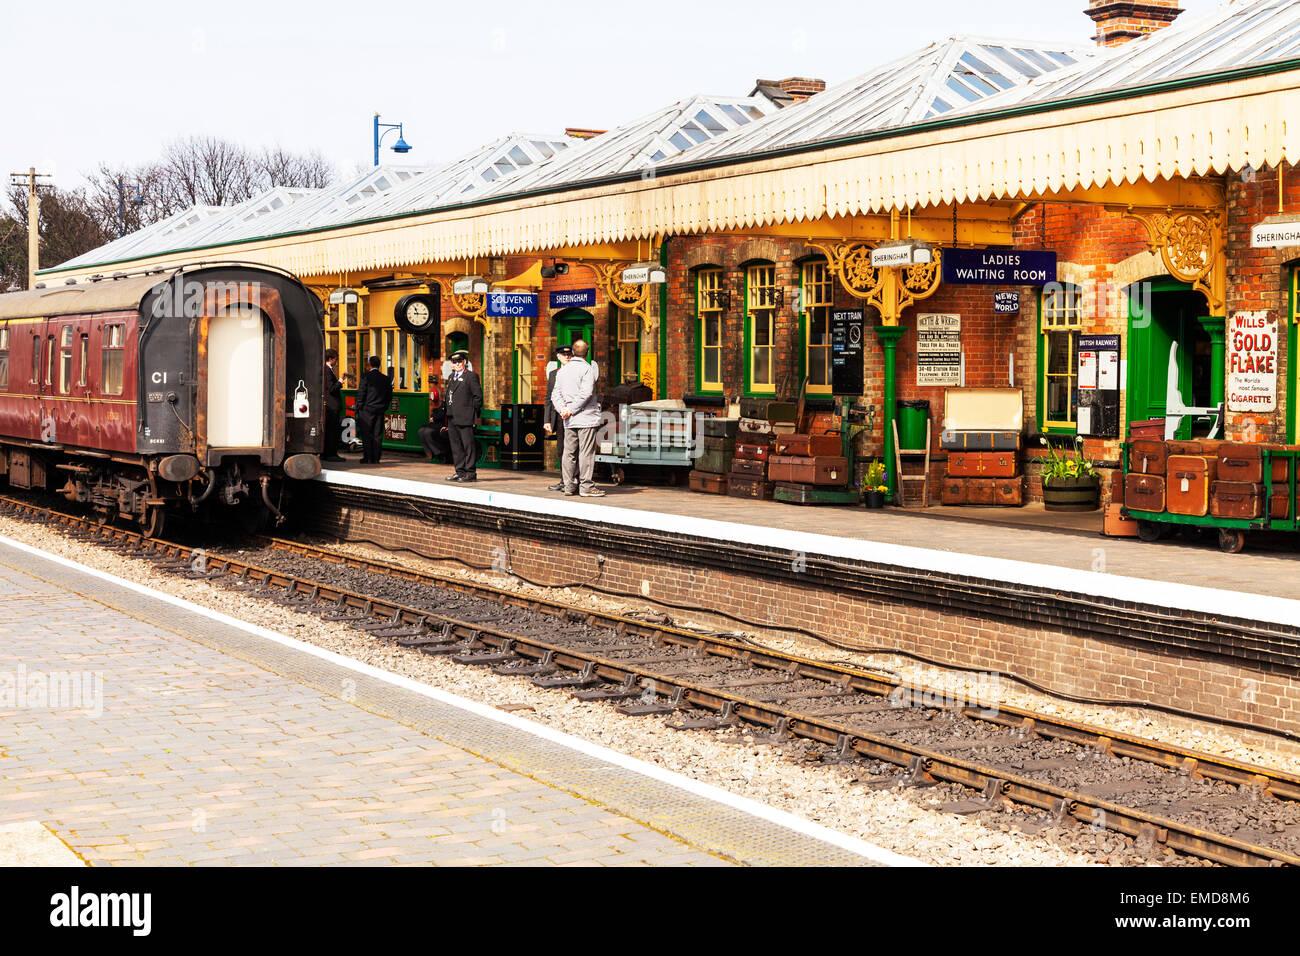 Sheringham station platform train luggage passengers waiting track rail railway line North Norfolk UK England - Stock Image